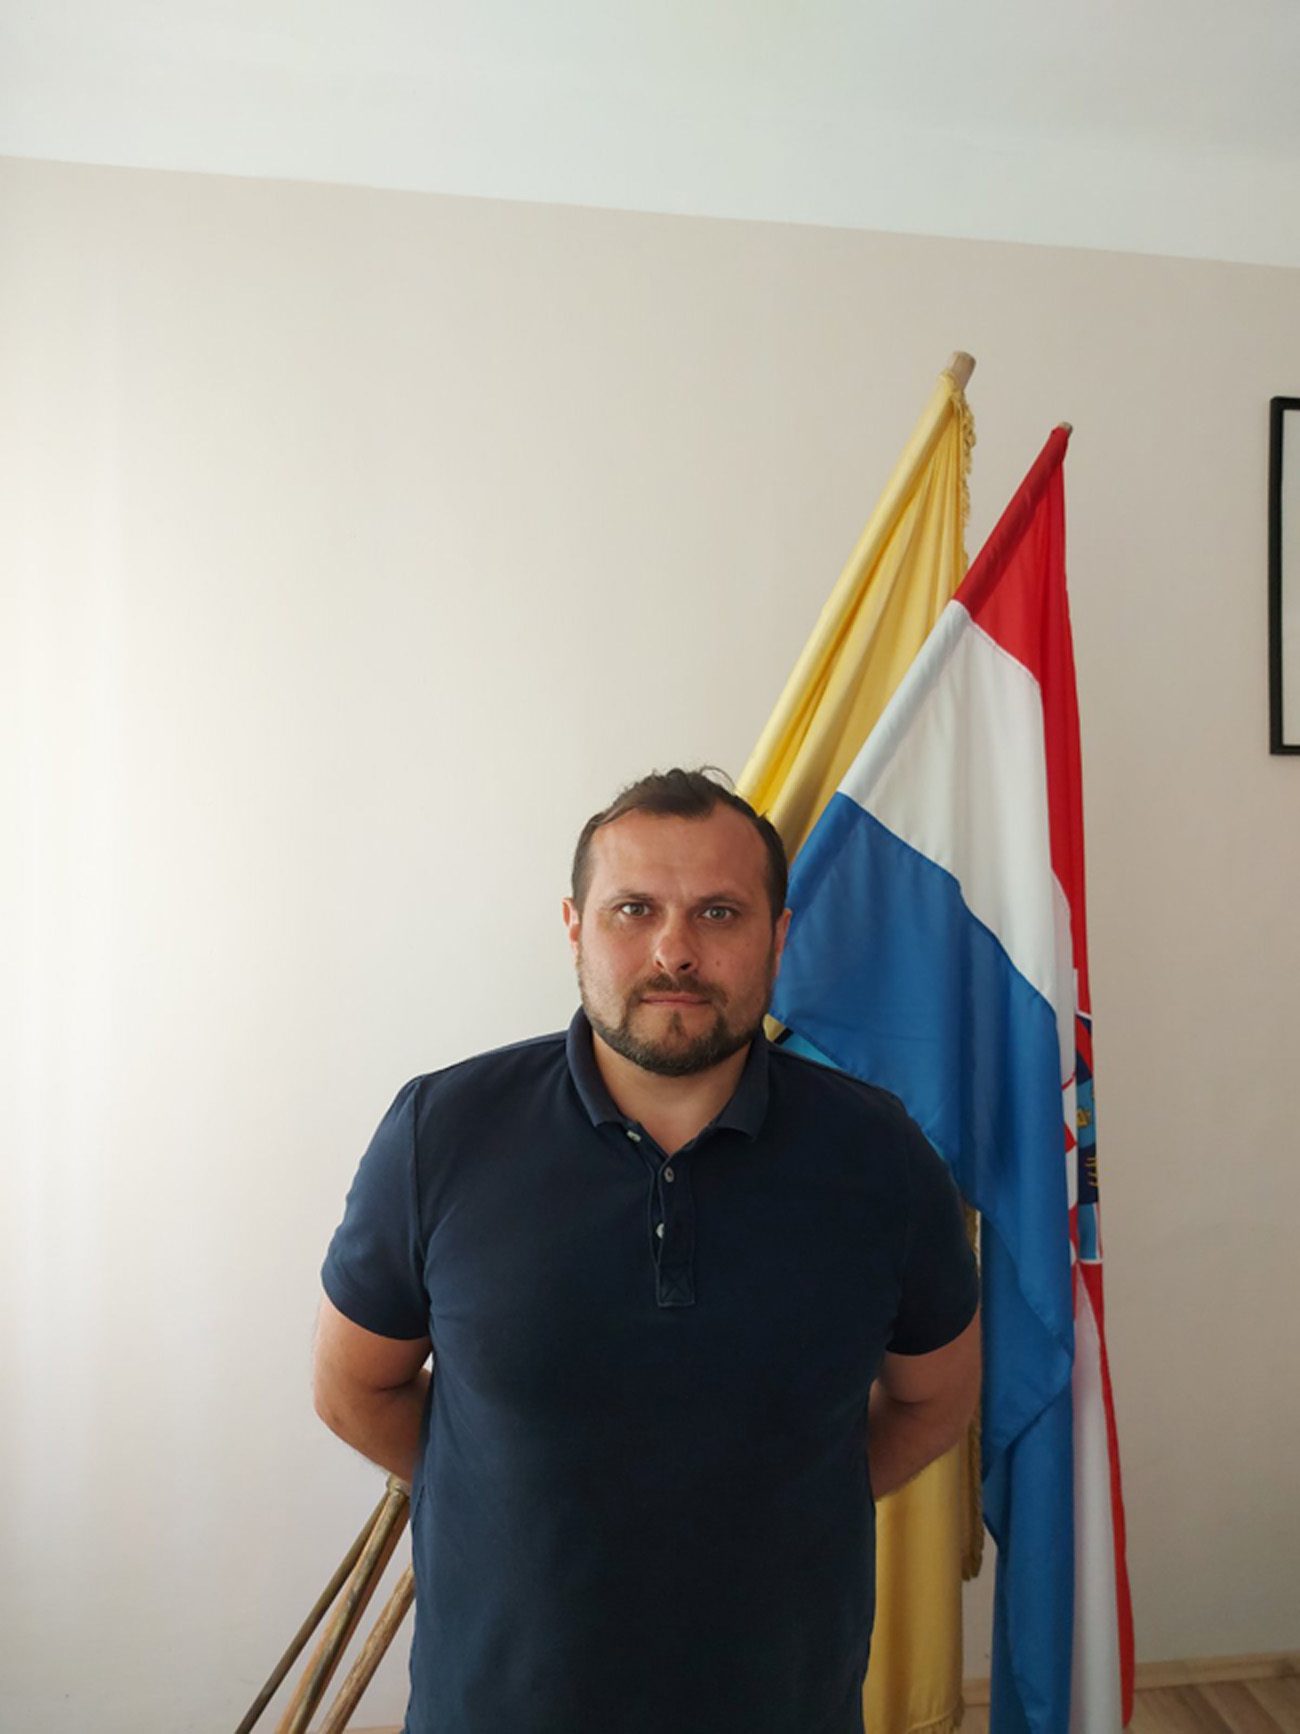 Kresimir Rajtaric lista grupe biraca Kresimir Rajtaric